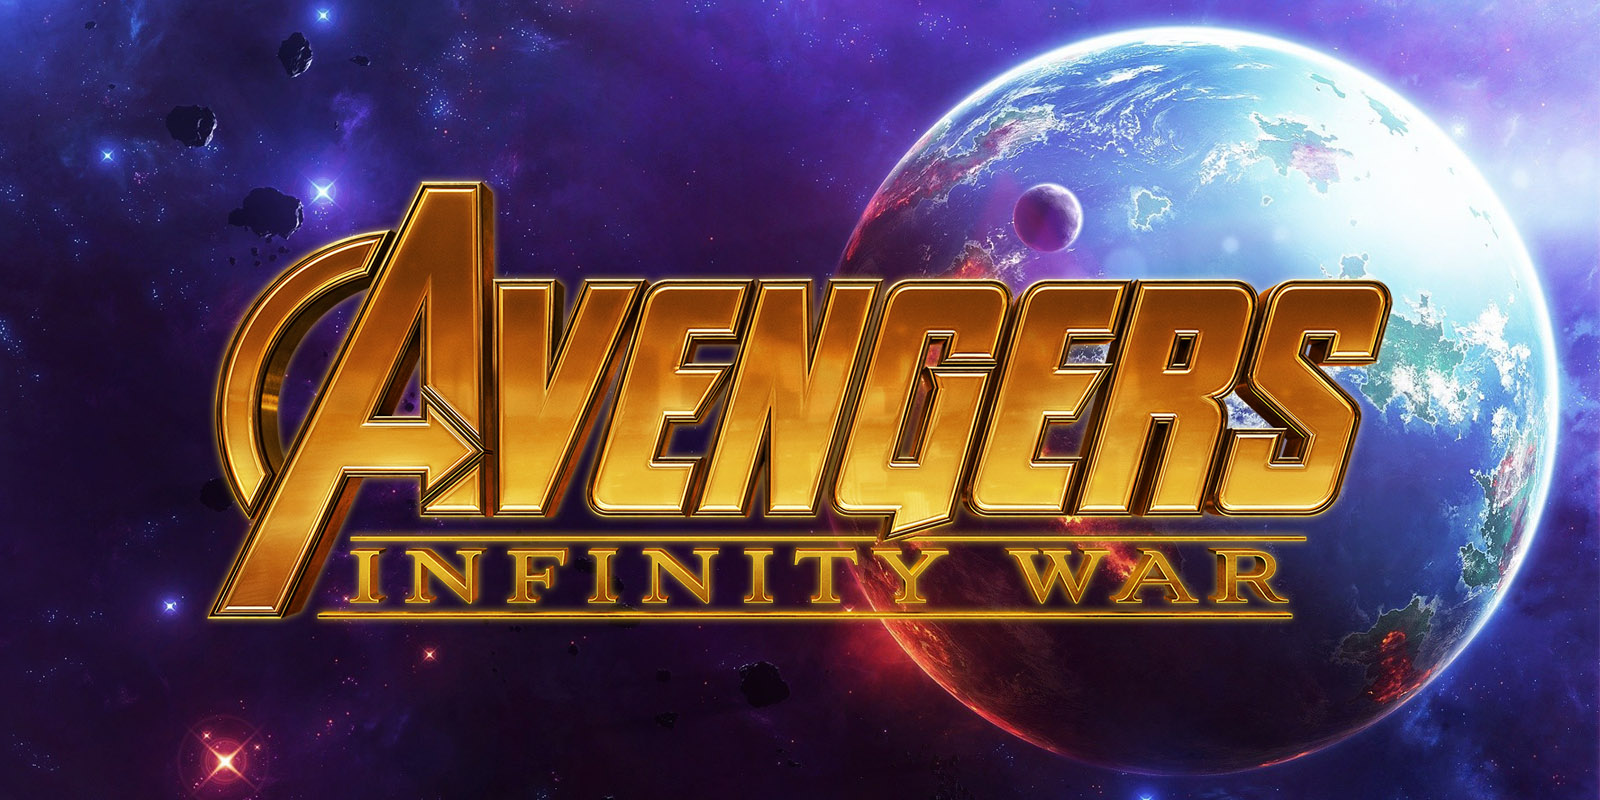 Avengers-Infinity-War-Cosmic.jpg